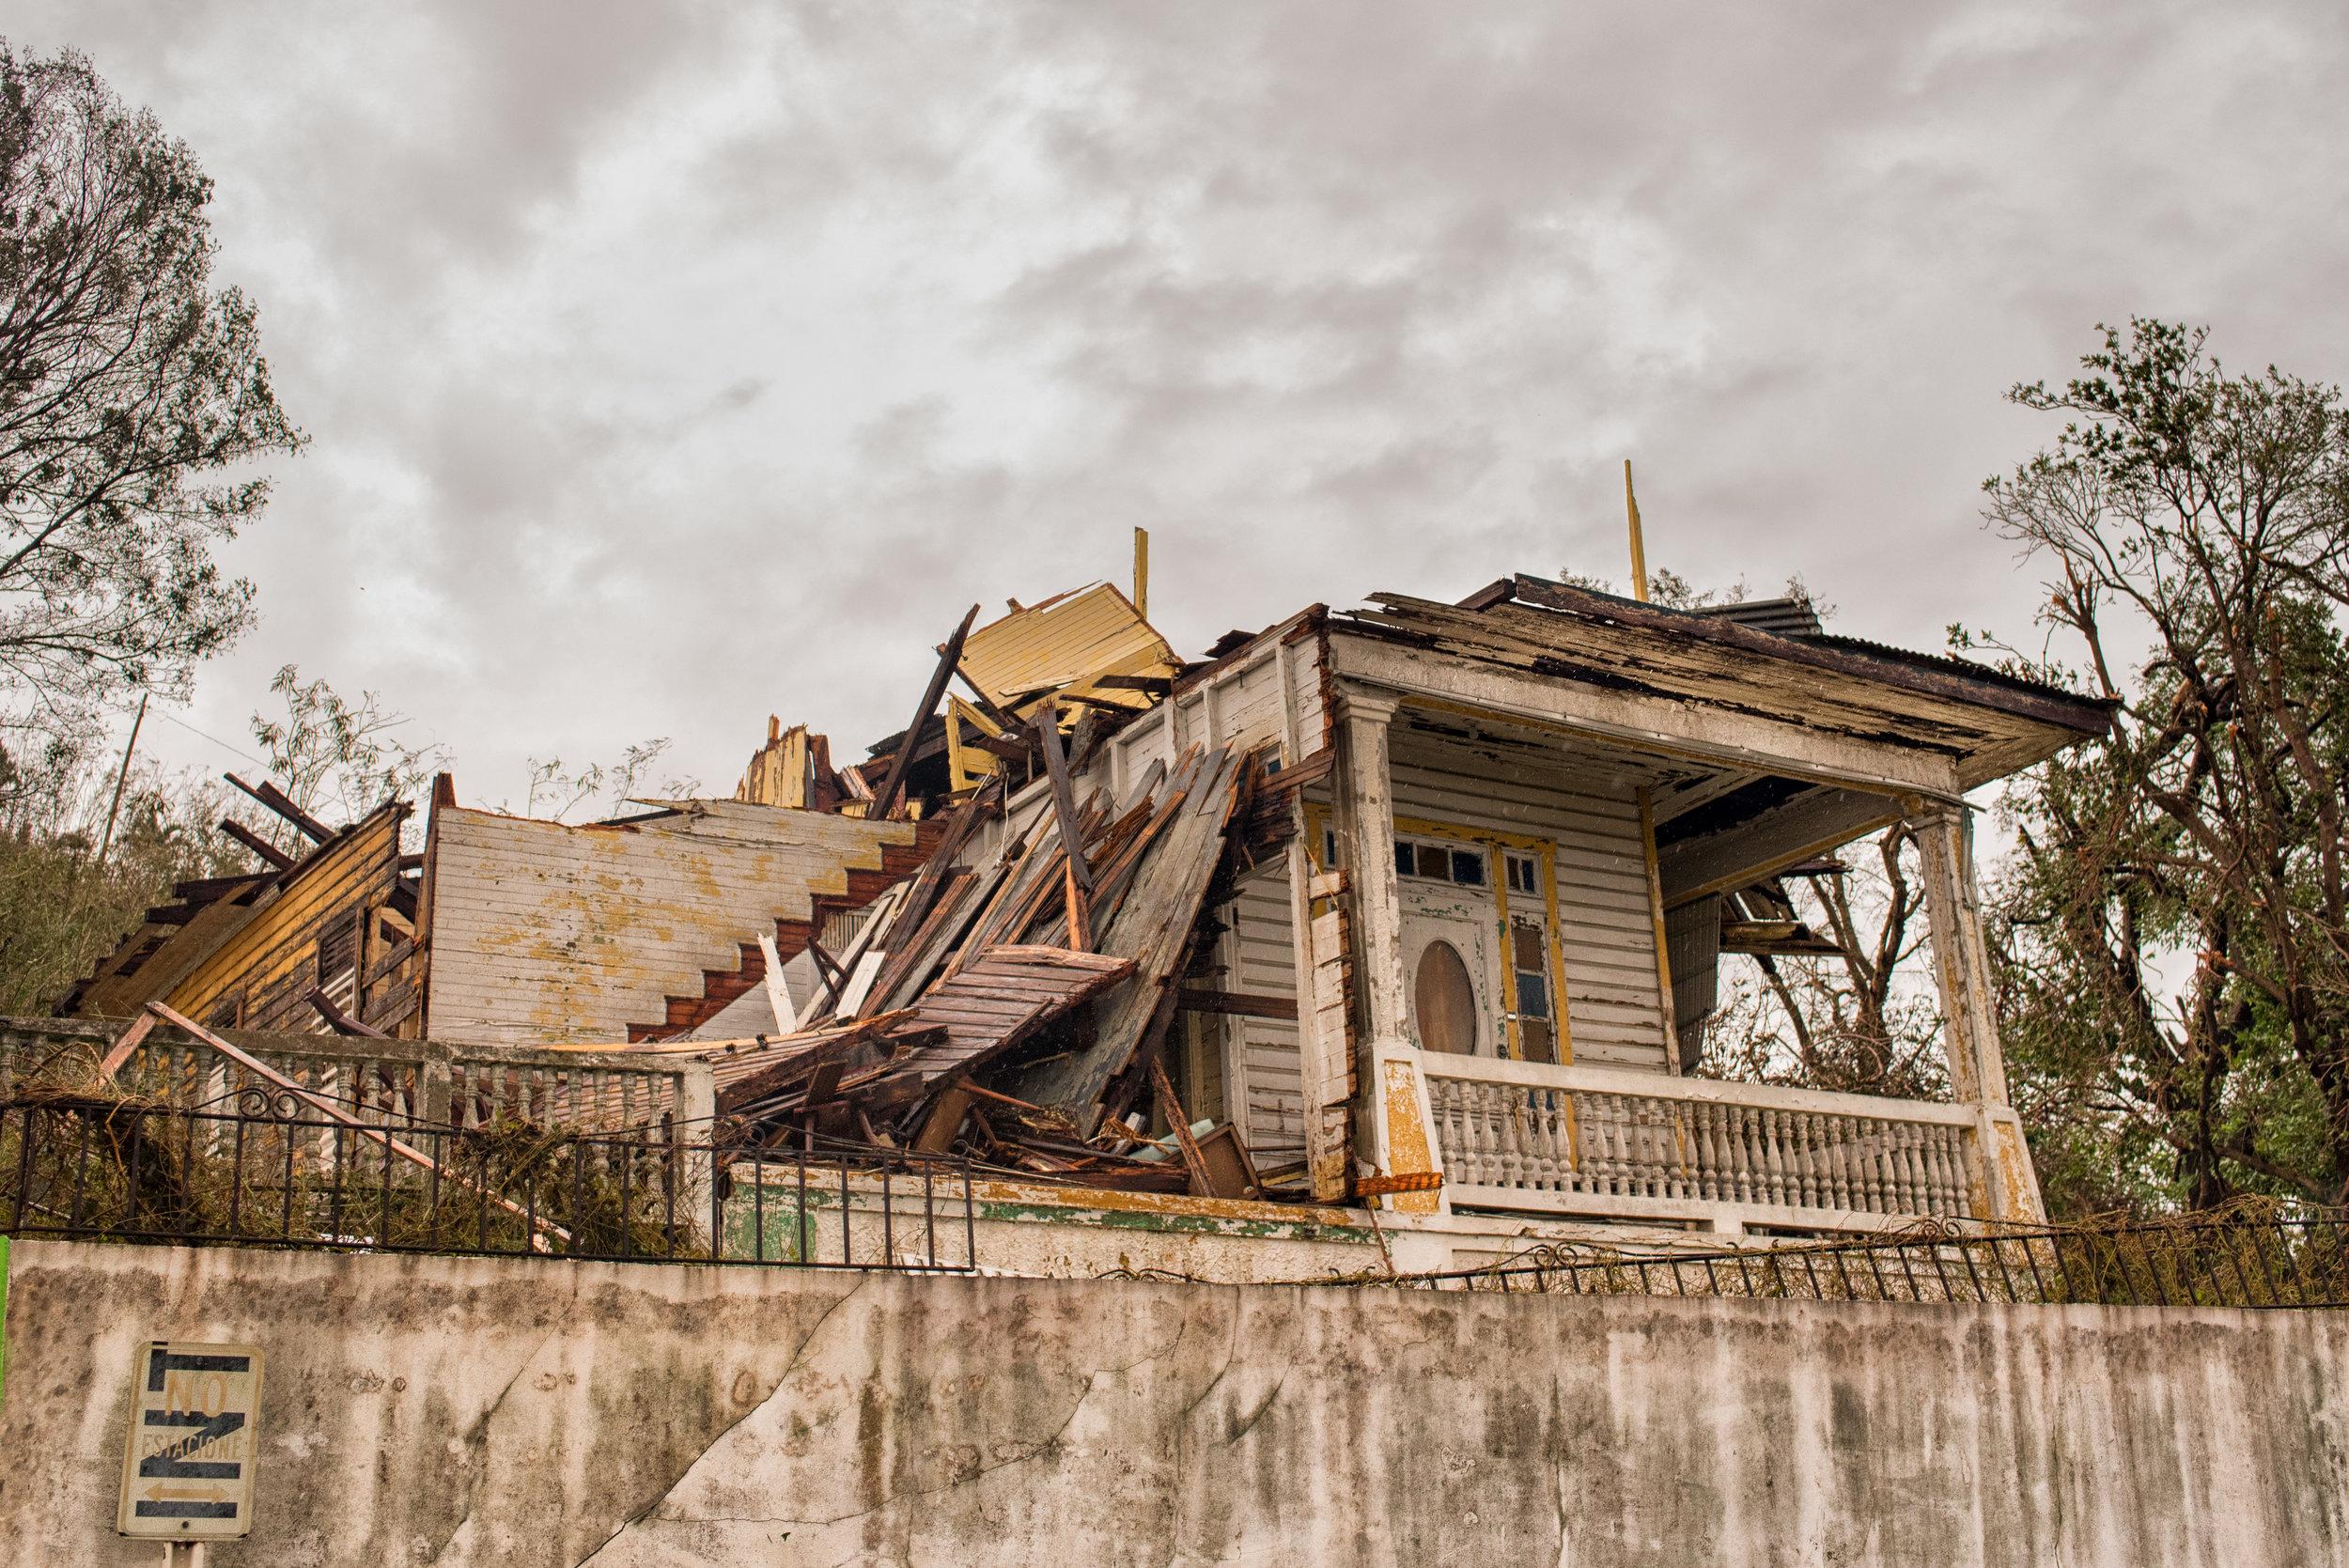 _Real_Life_Hurricane_Maria-34.jpg